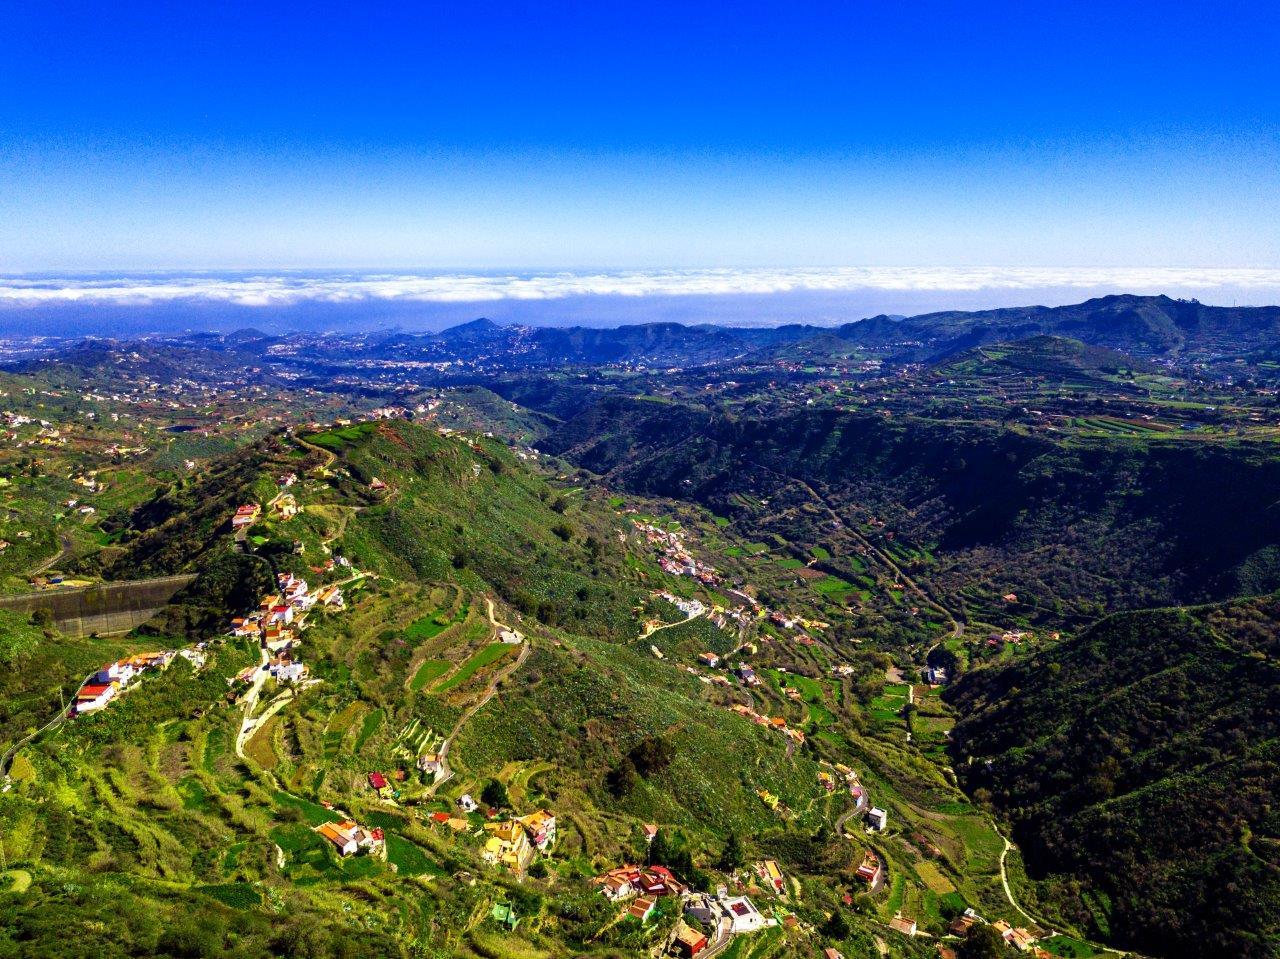 DJI_0412 Near Canarias Etnografica, looking south, Gran Canaria. Drone..jpg